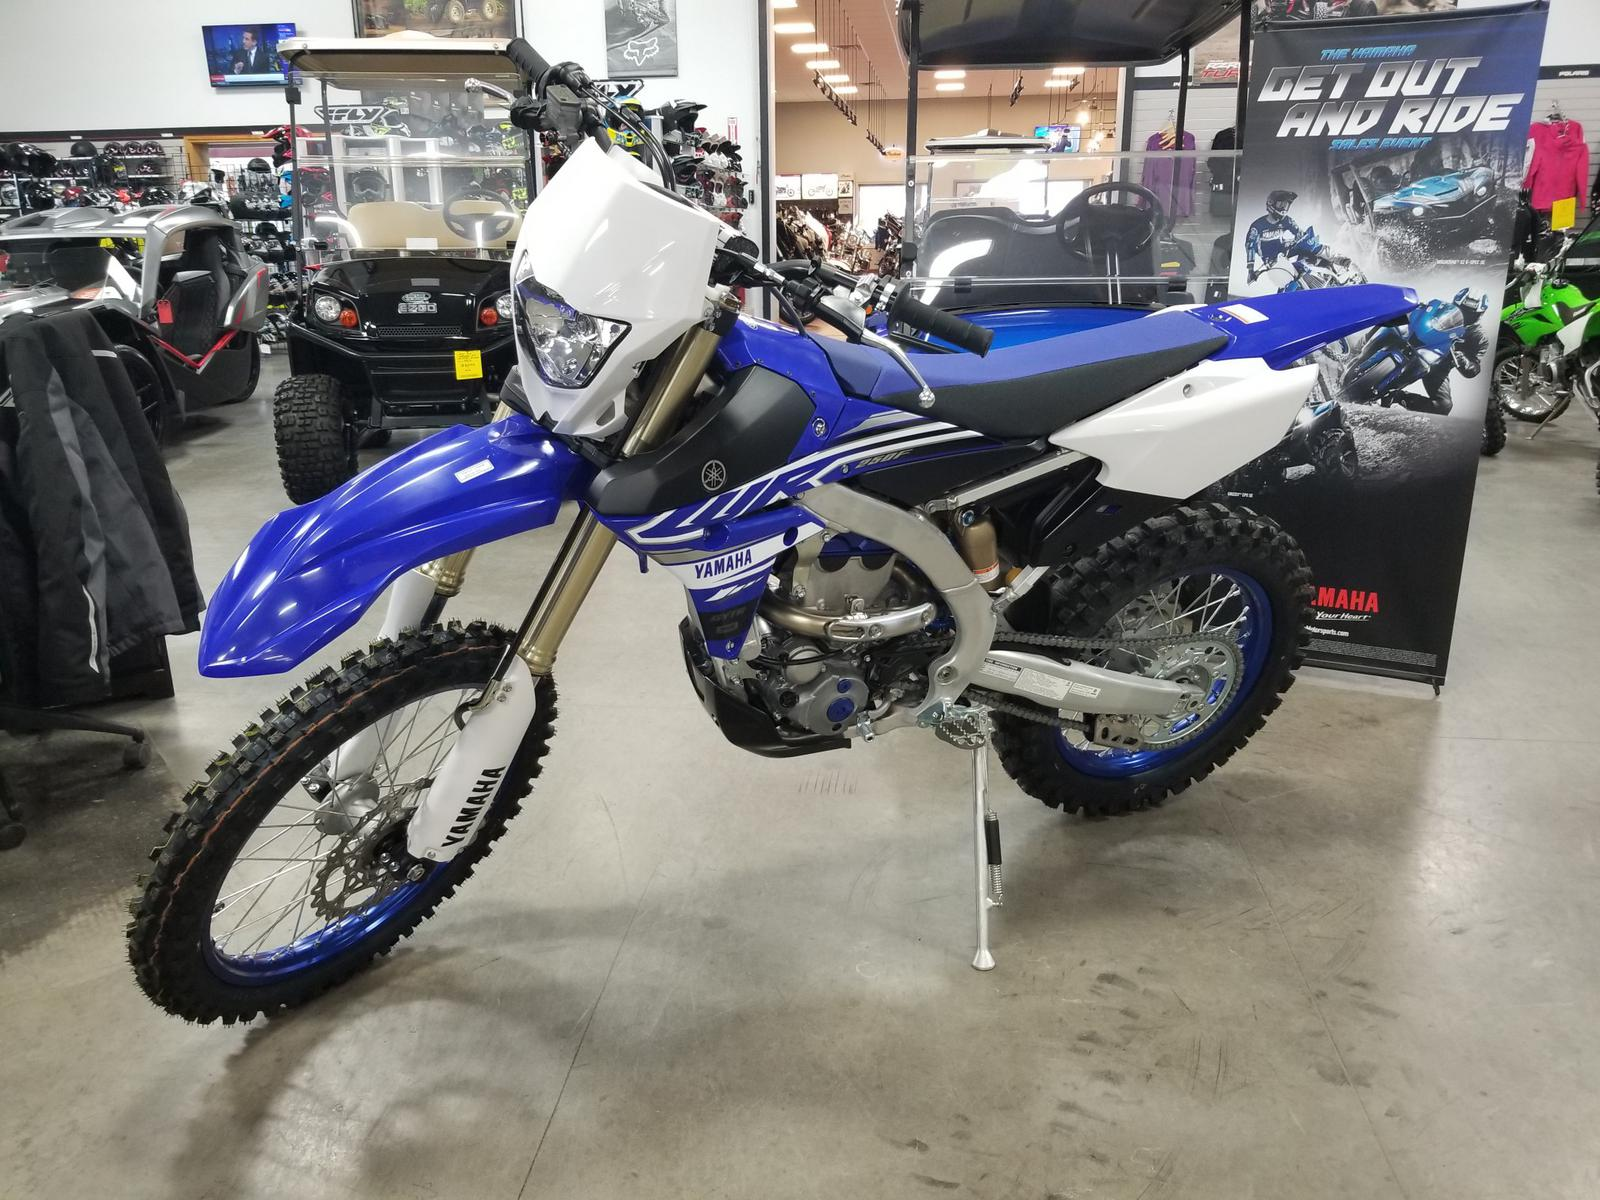 Inventory from Yamaha Lakeside Motor Sports Mecosta, MI (888